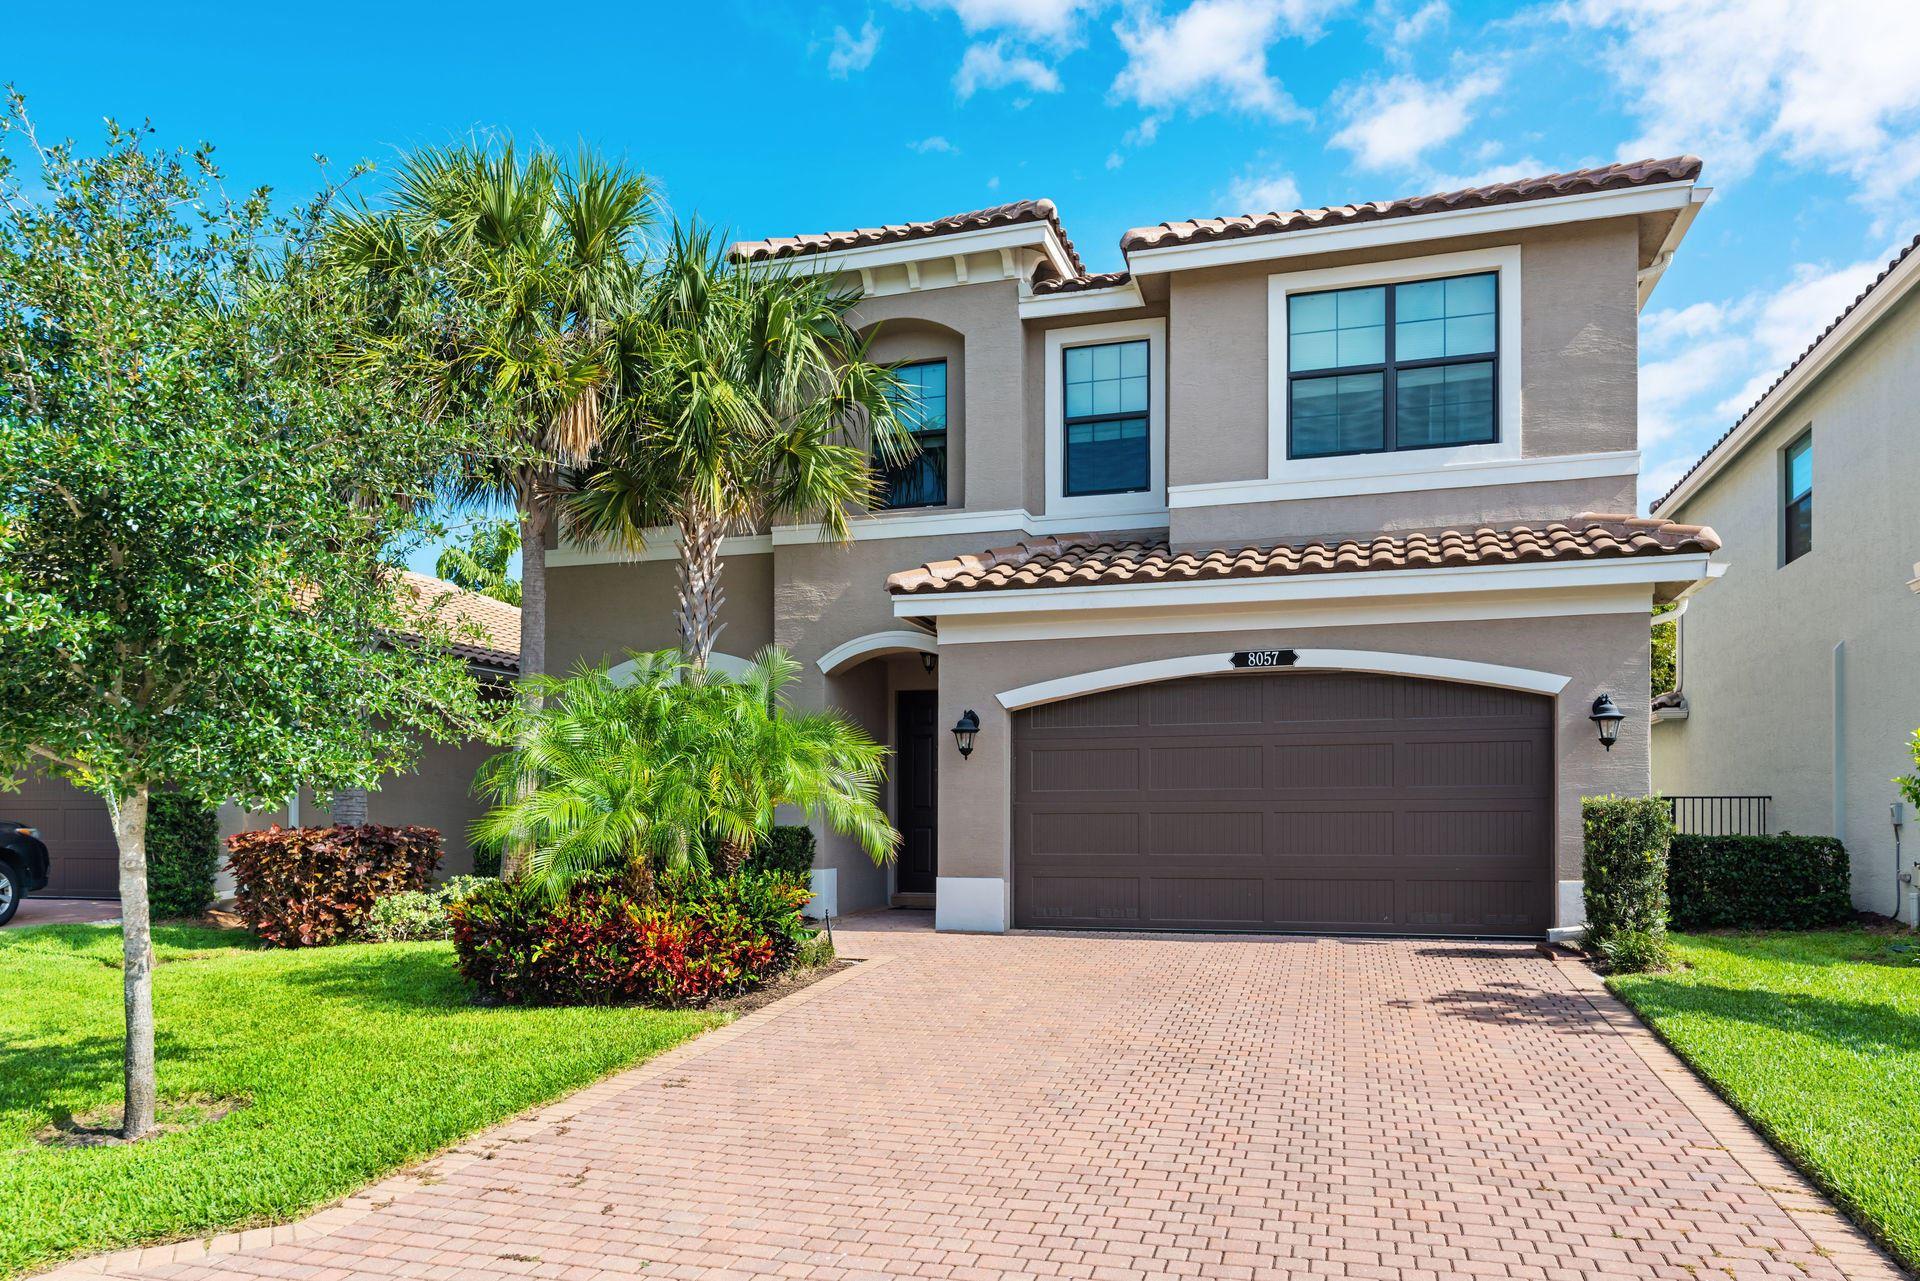 8057 Green Tourmaline Terrace, Delray Beach, FL 33446 - #: RX-10621122